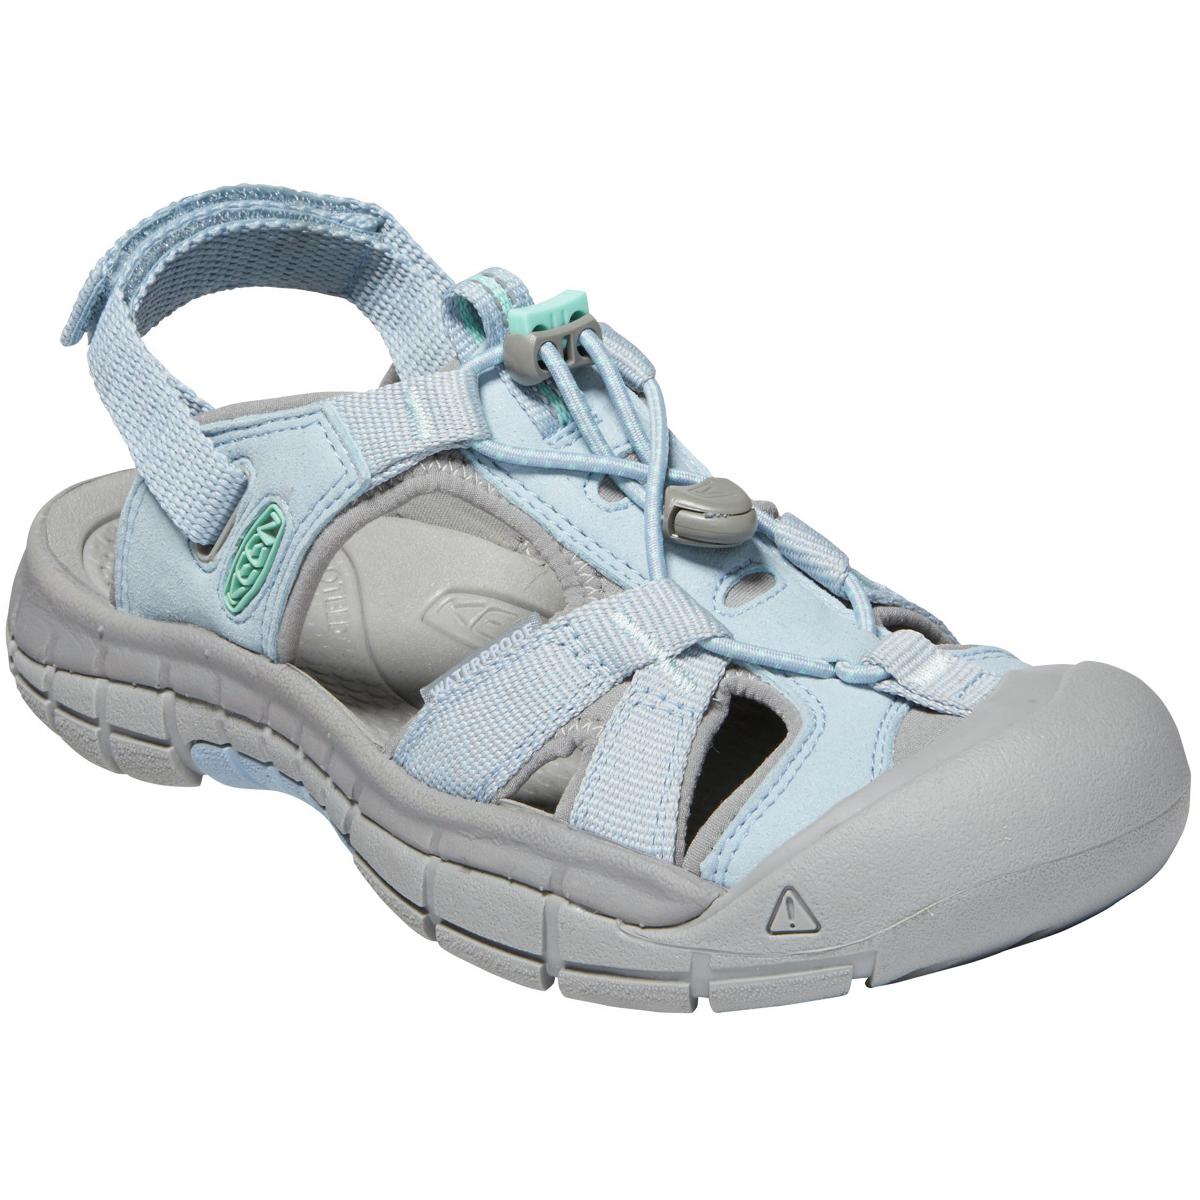 Keen Women's Ravine H2 Sandals - Blue, 7.5